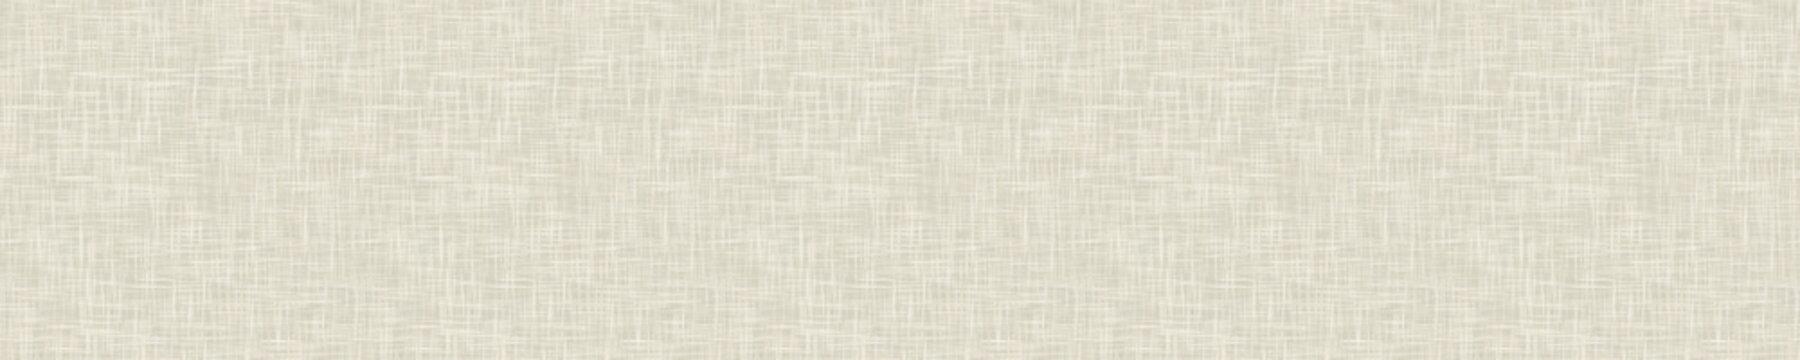 Seamless white grey woven linen texture background. Raw ecru flax hemp fiber natural pattern. Organic fibre close up weave fabric for surface material. Plain natural gray cloth textured rough canvas